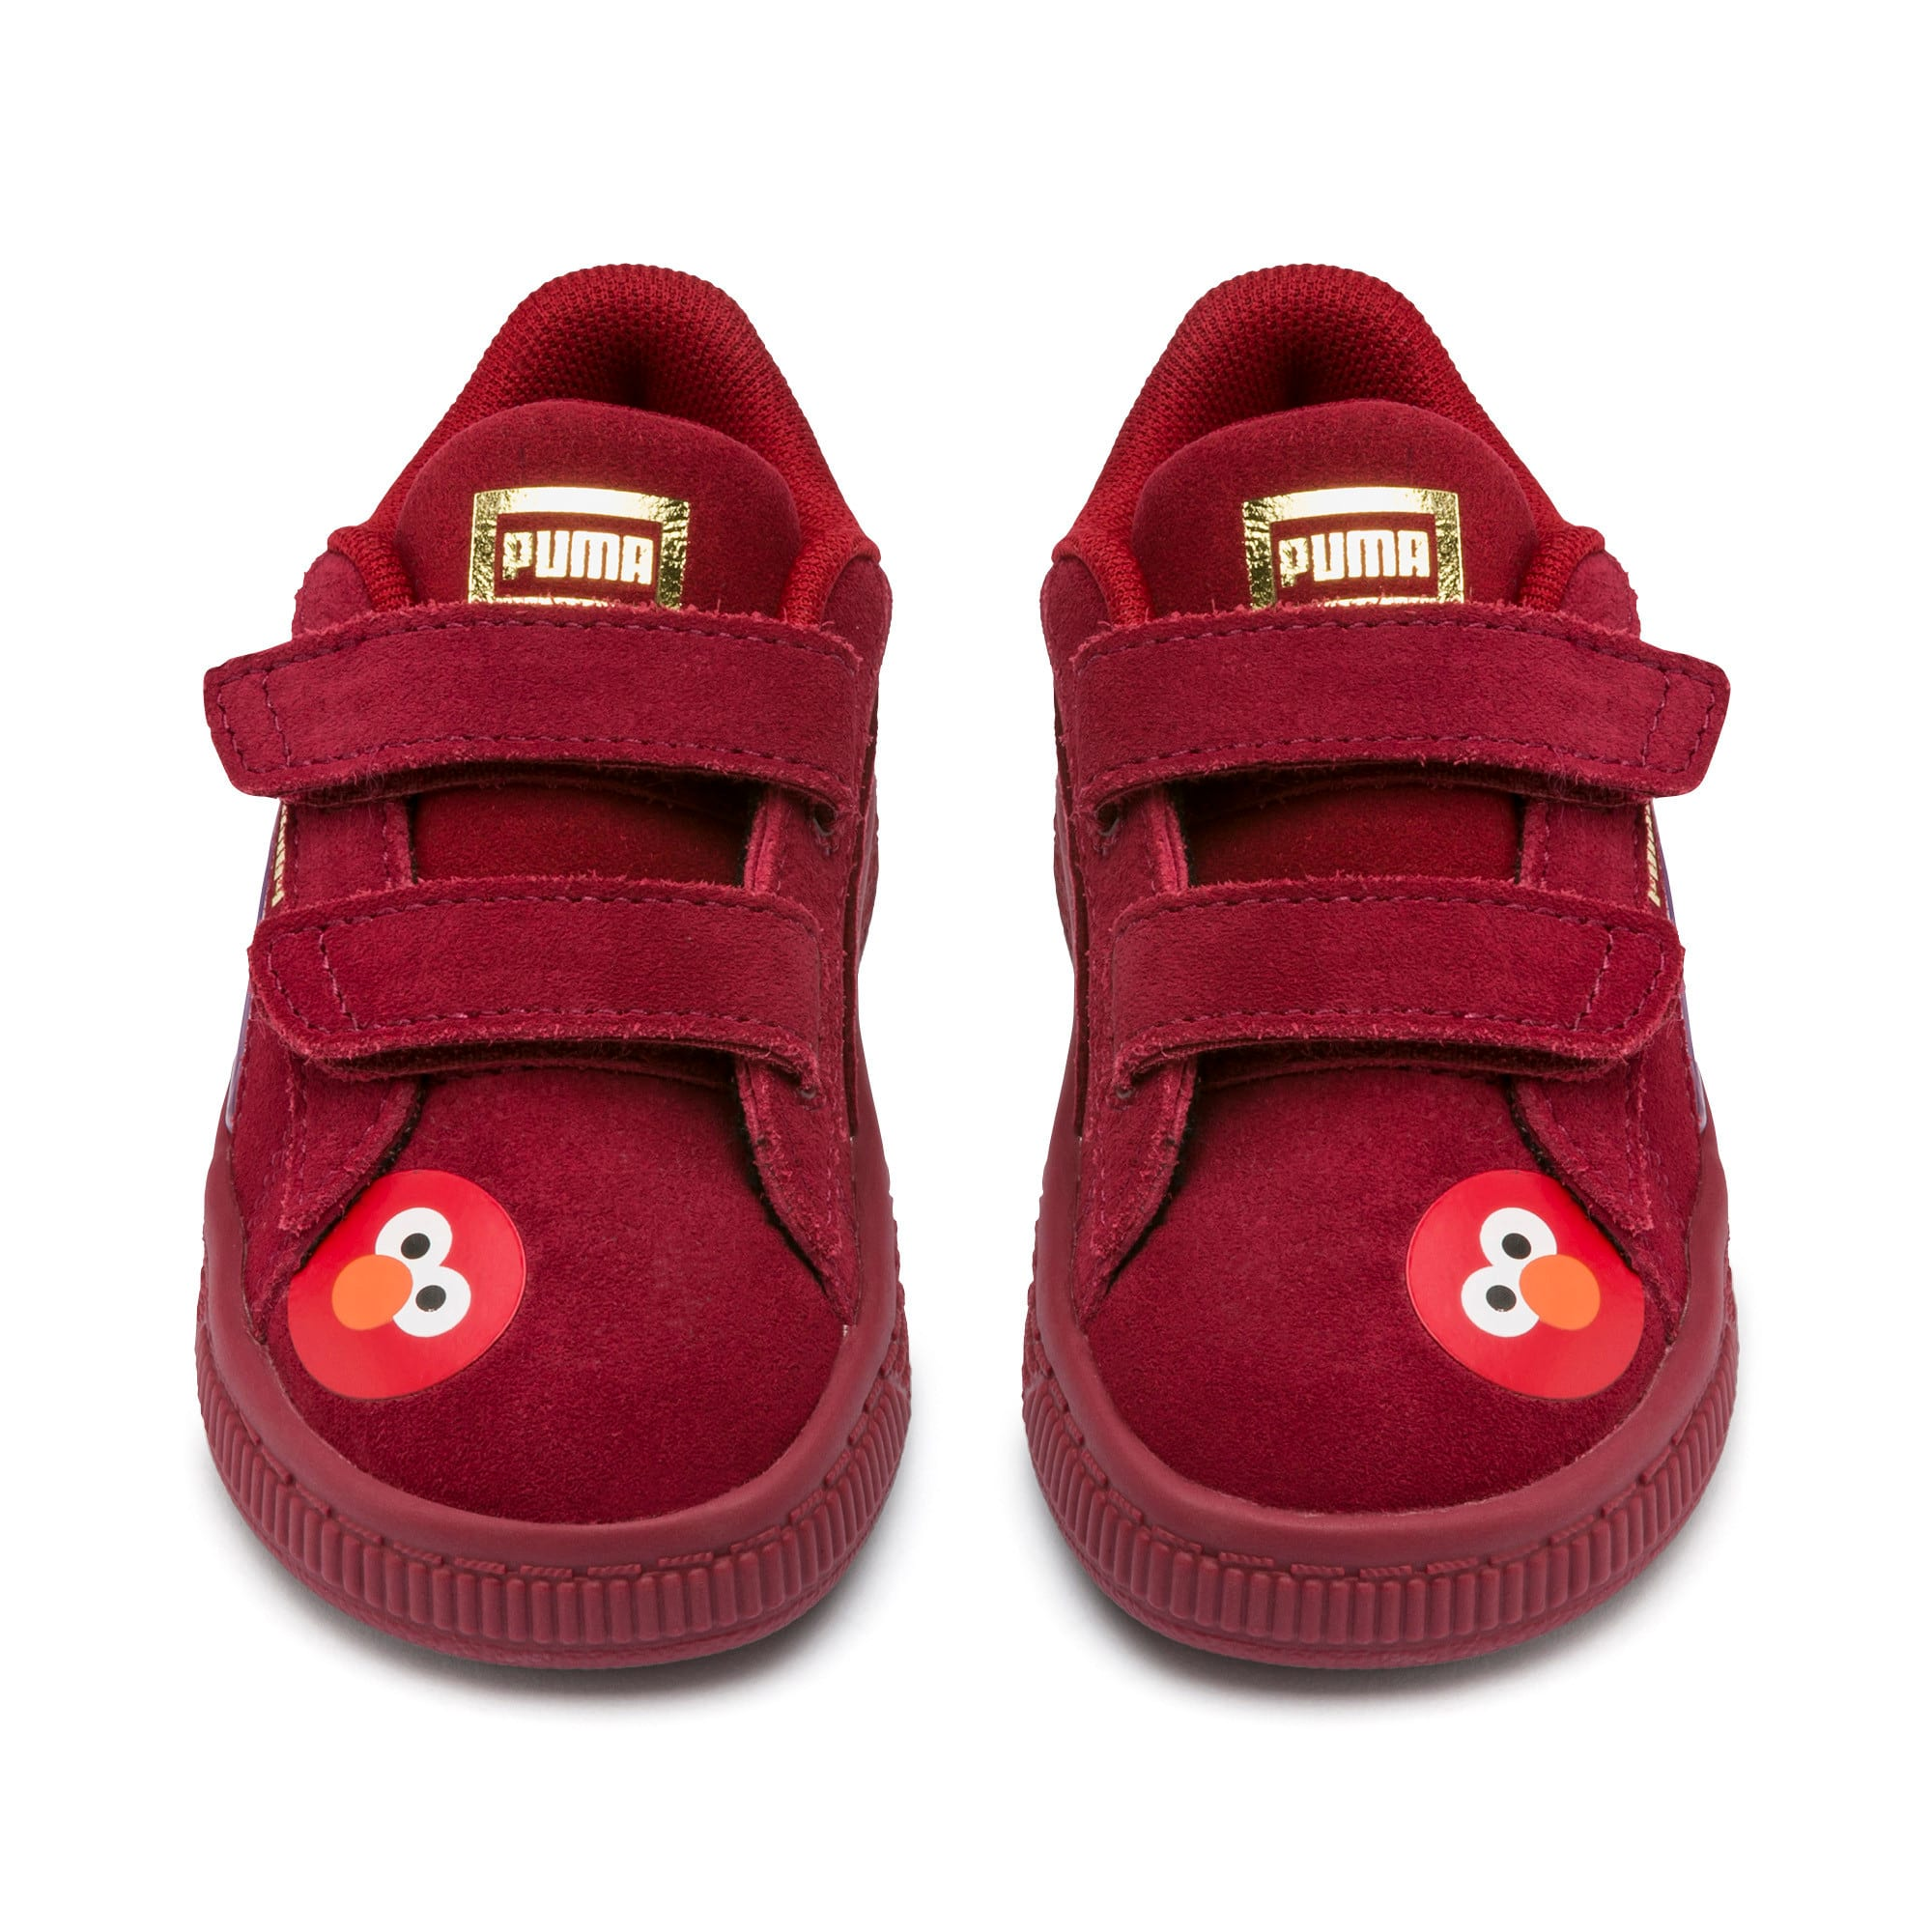 Thumbnail 7 of PUMA x SESAME STREET 50 Suede Statement Toddler Shoes, Rhubarb-Puma White, medium